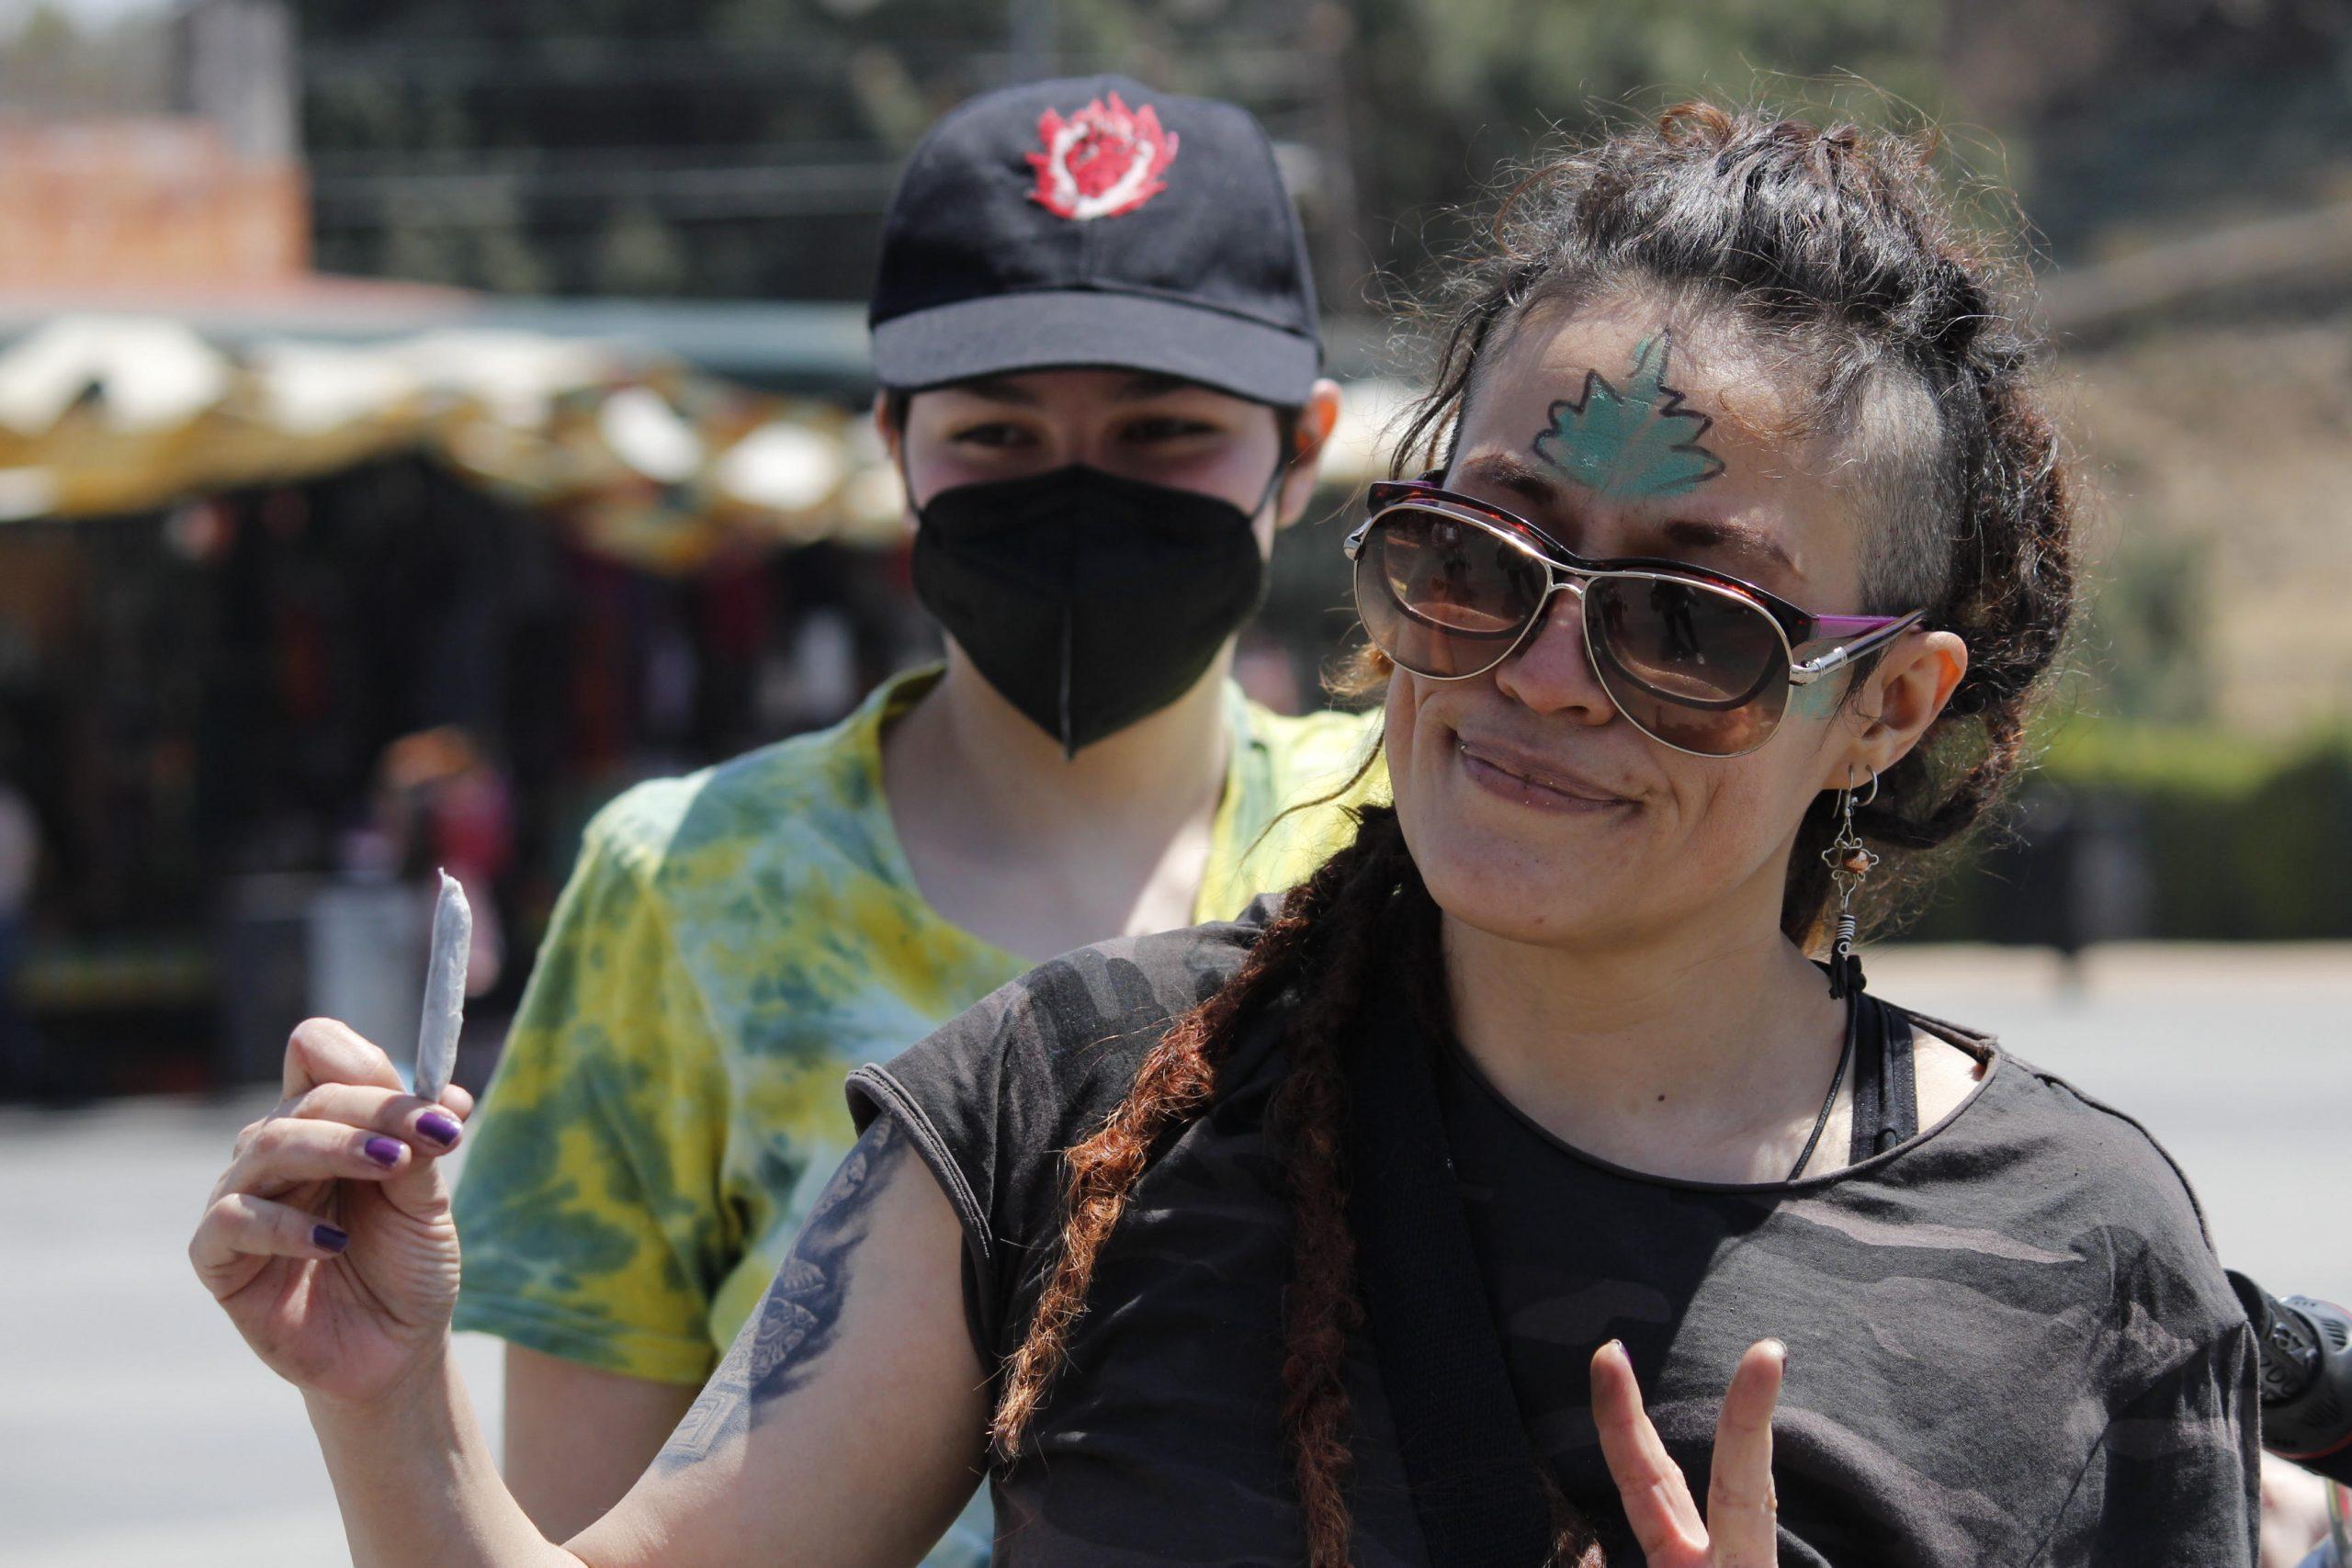 Rodada Canábica Ancenstral reunió alrededor de 100 cicilistas